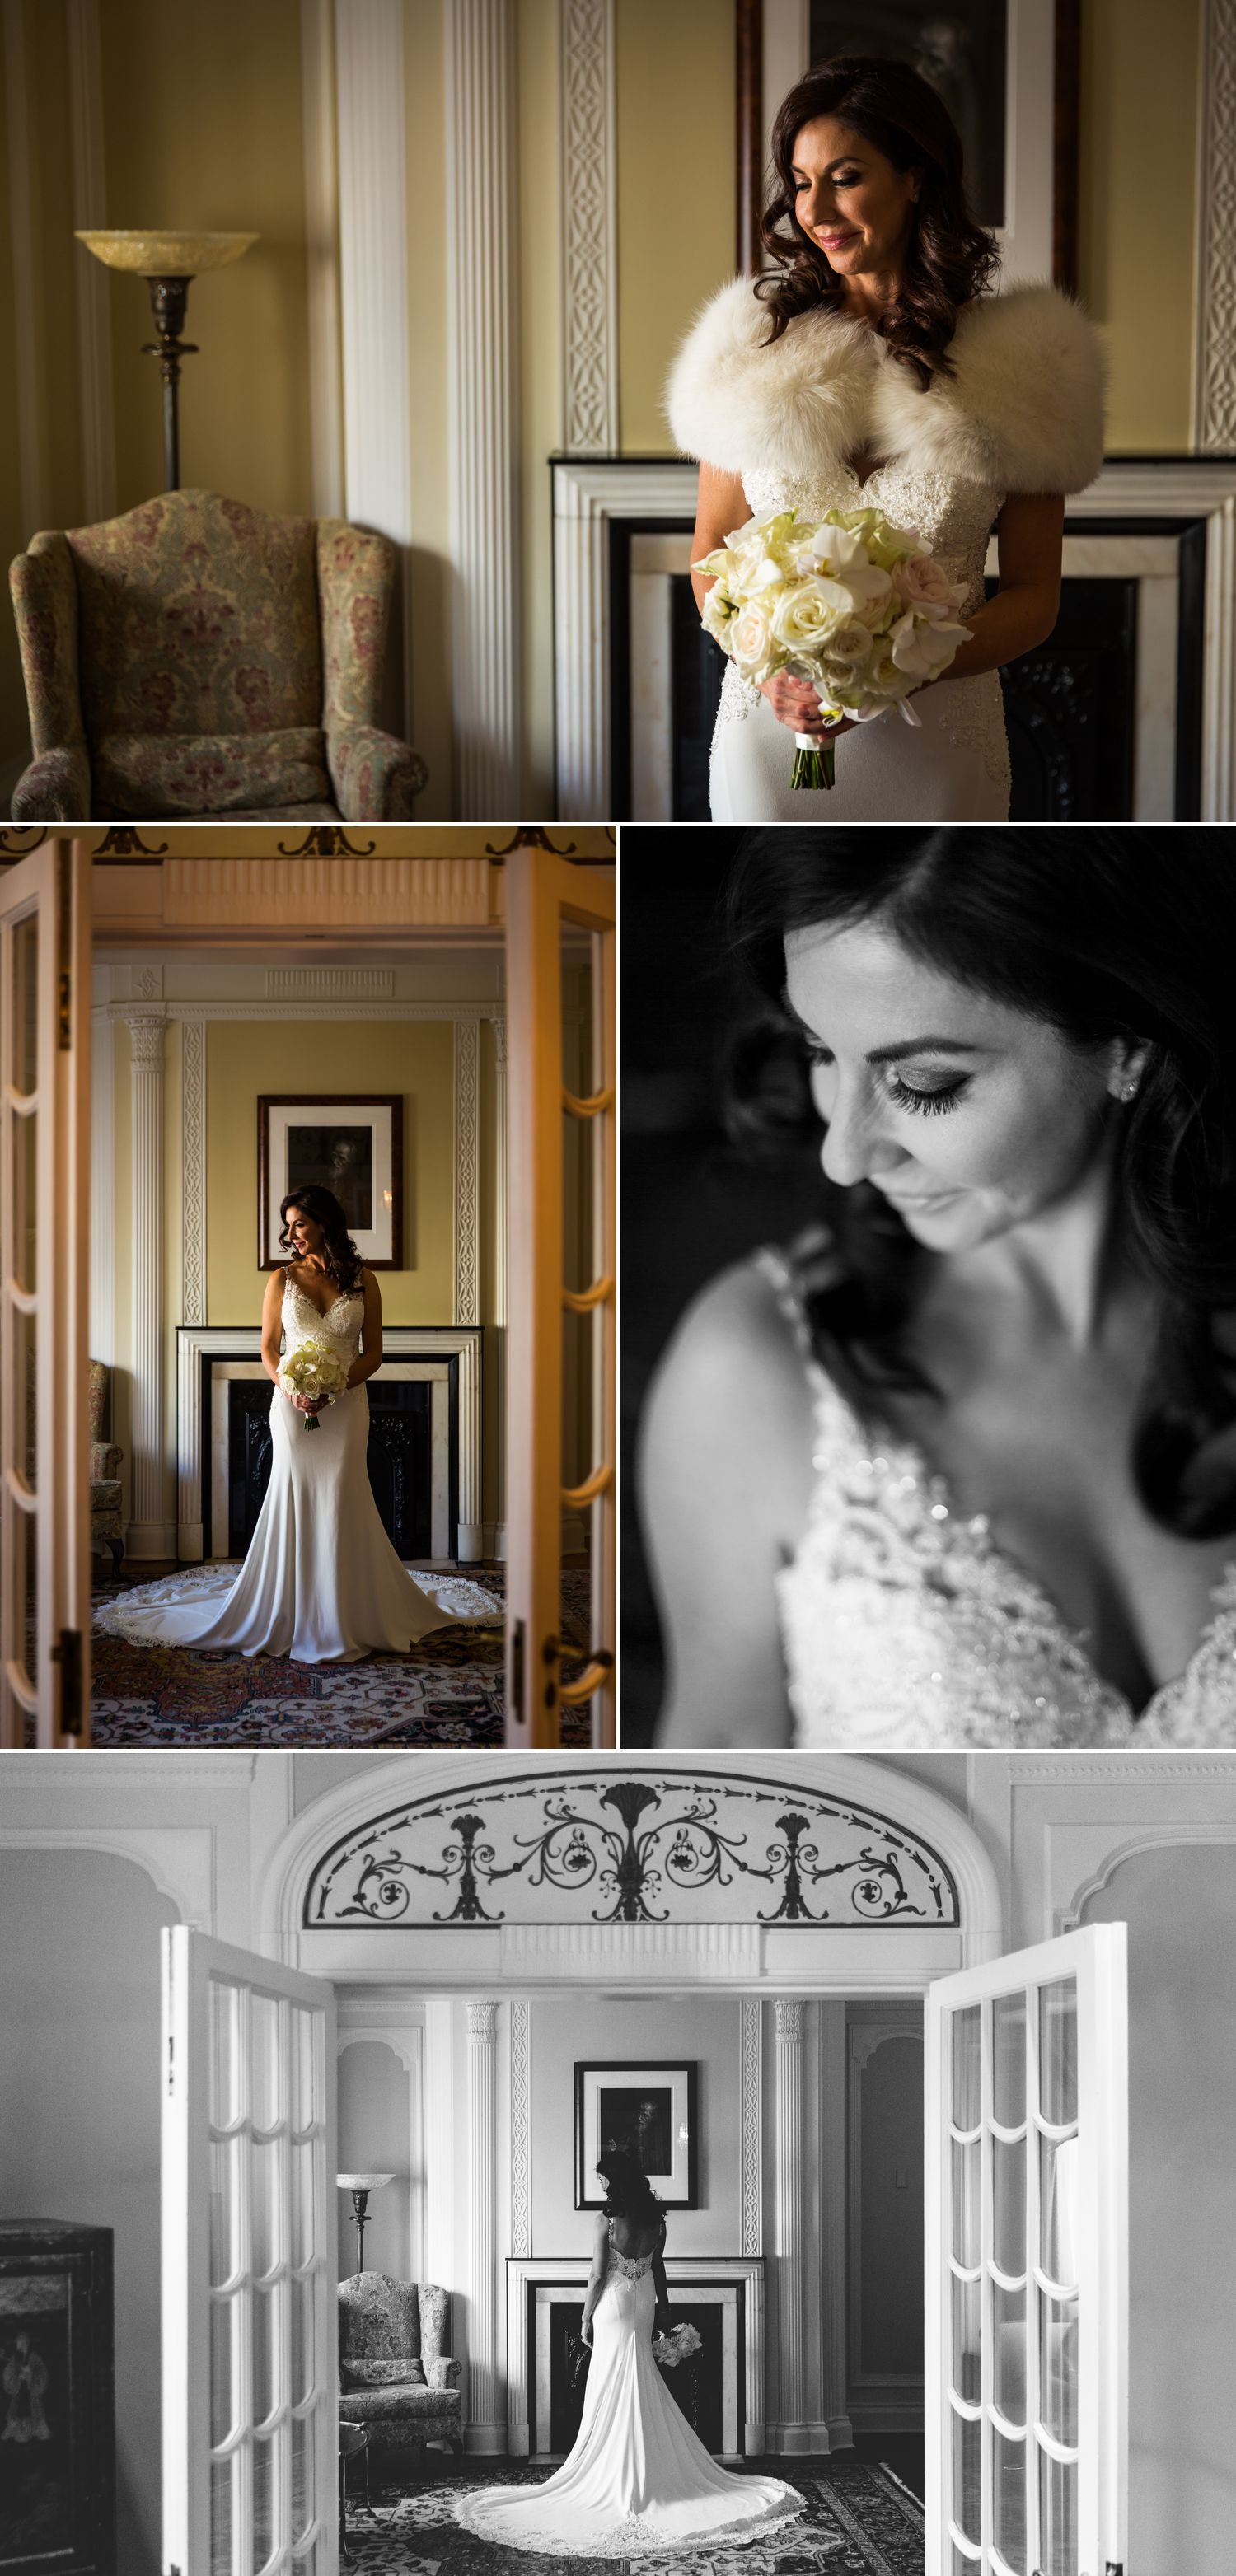 Bridal portrait at le chateau laurier in Ottawa